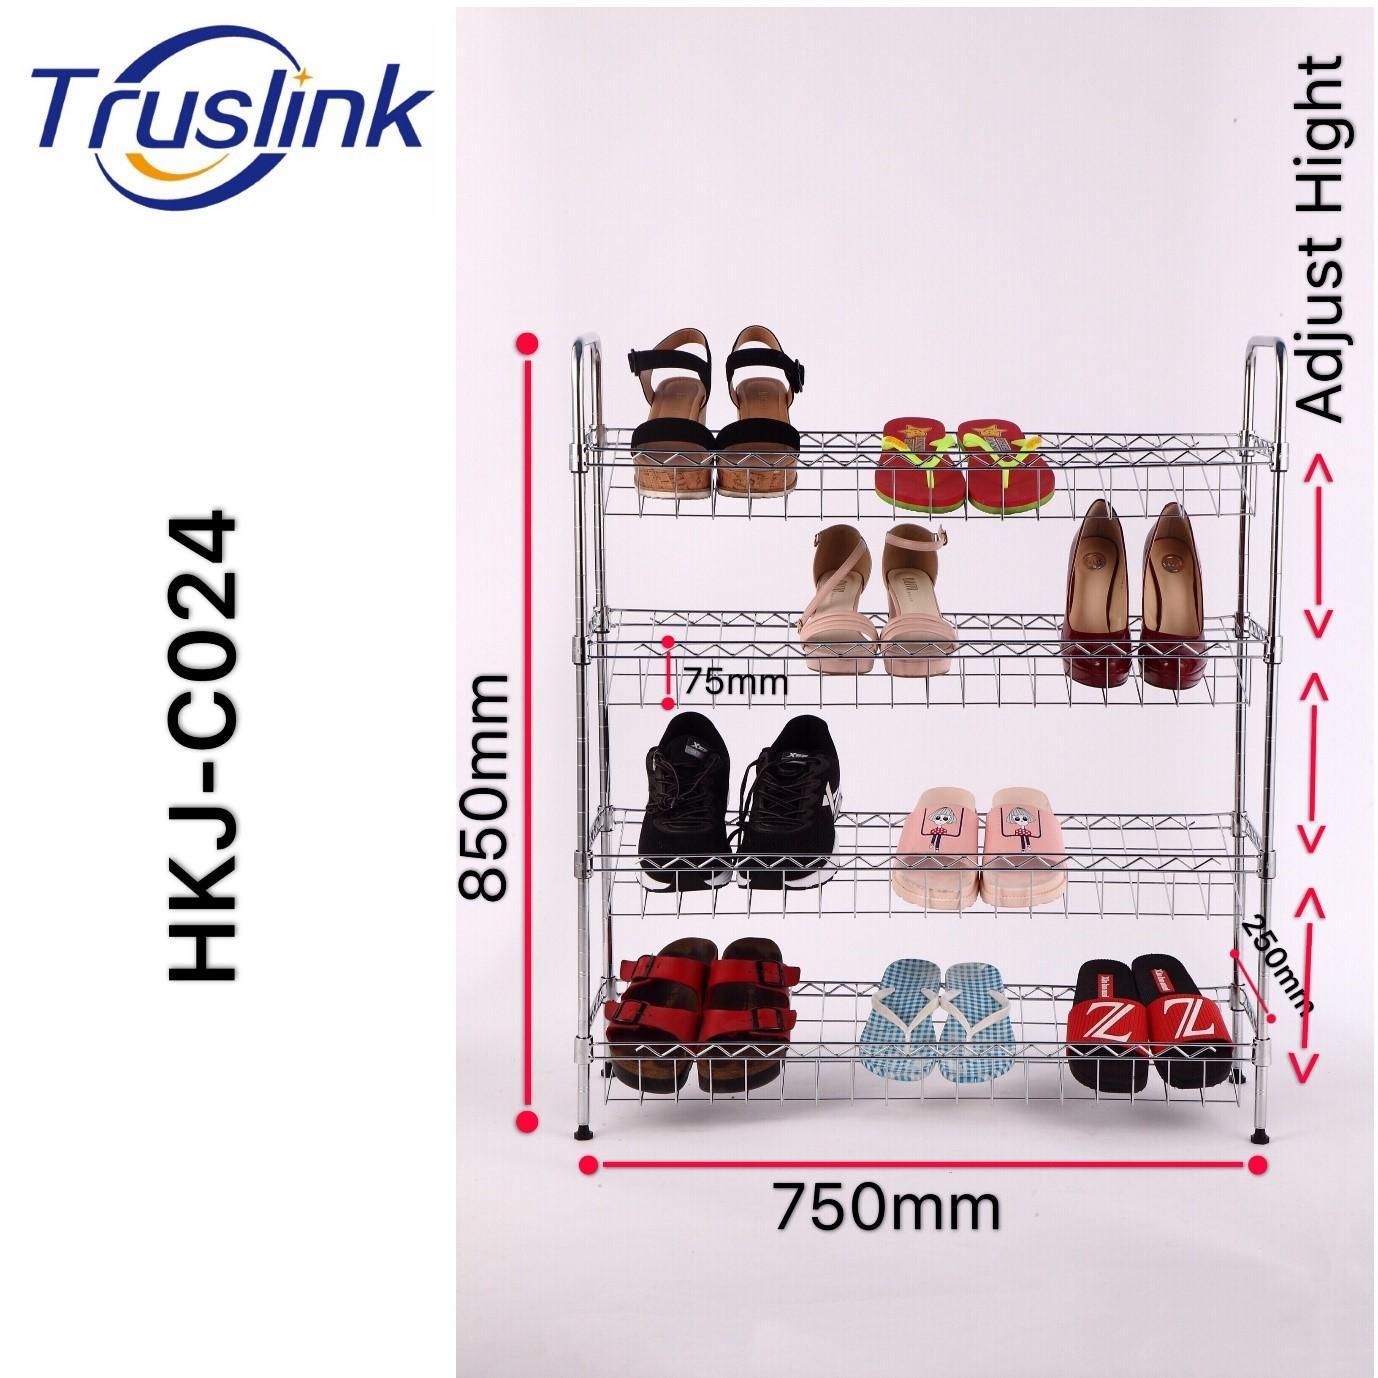 [SG Seller] Truslink  4 Tiers Waterproof Anti-corrosion Height Adjustable Simple Shoe Rack Assembled Multi Layer Cheap Modern minimalist shoe rack storage rack----Linear Space HKJ-C024